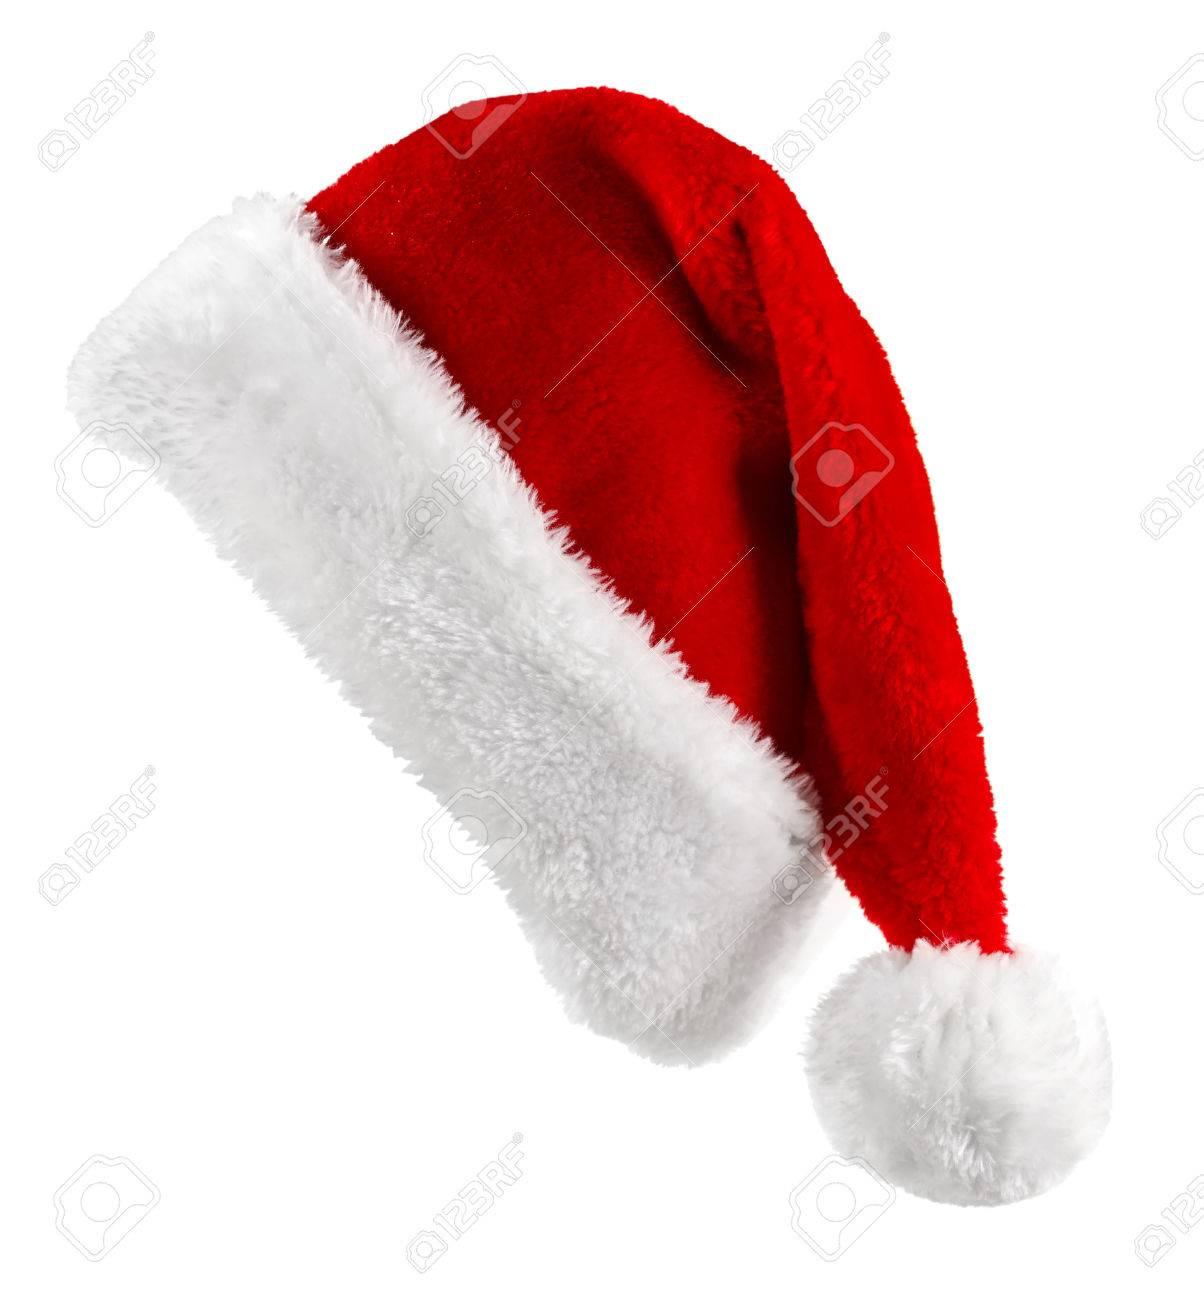 Santa Claus red hat - 33896291